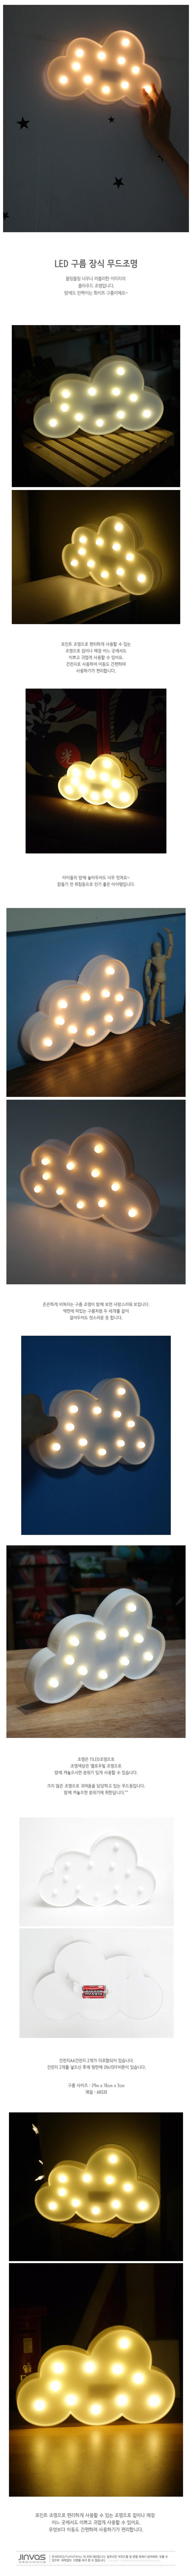 LED 구름 장식 무드조명 - 진바스, 9,000원, 리빙조명, 벽조명